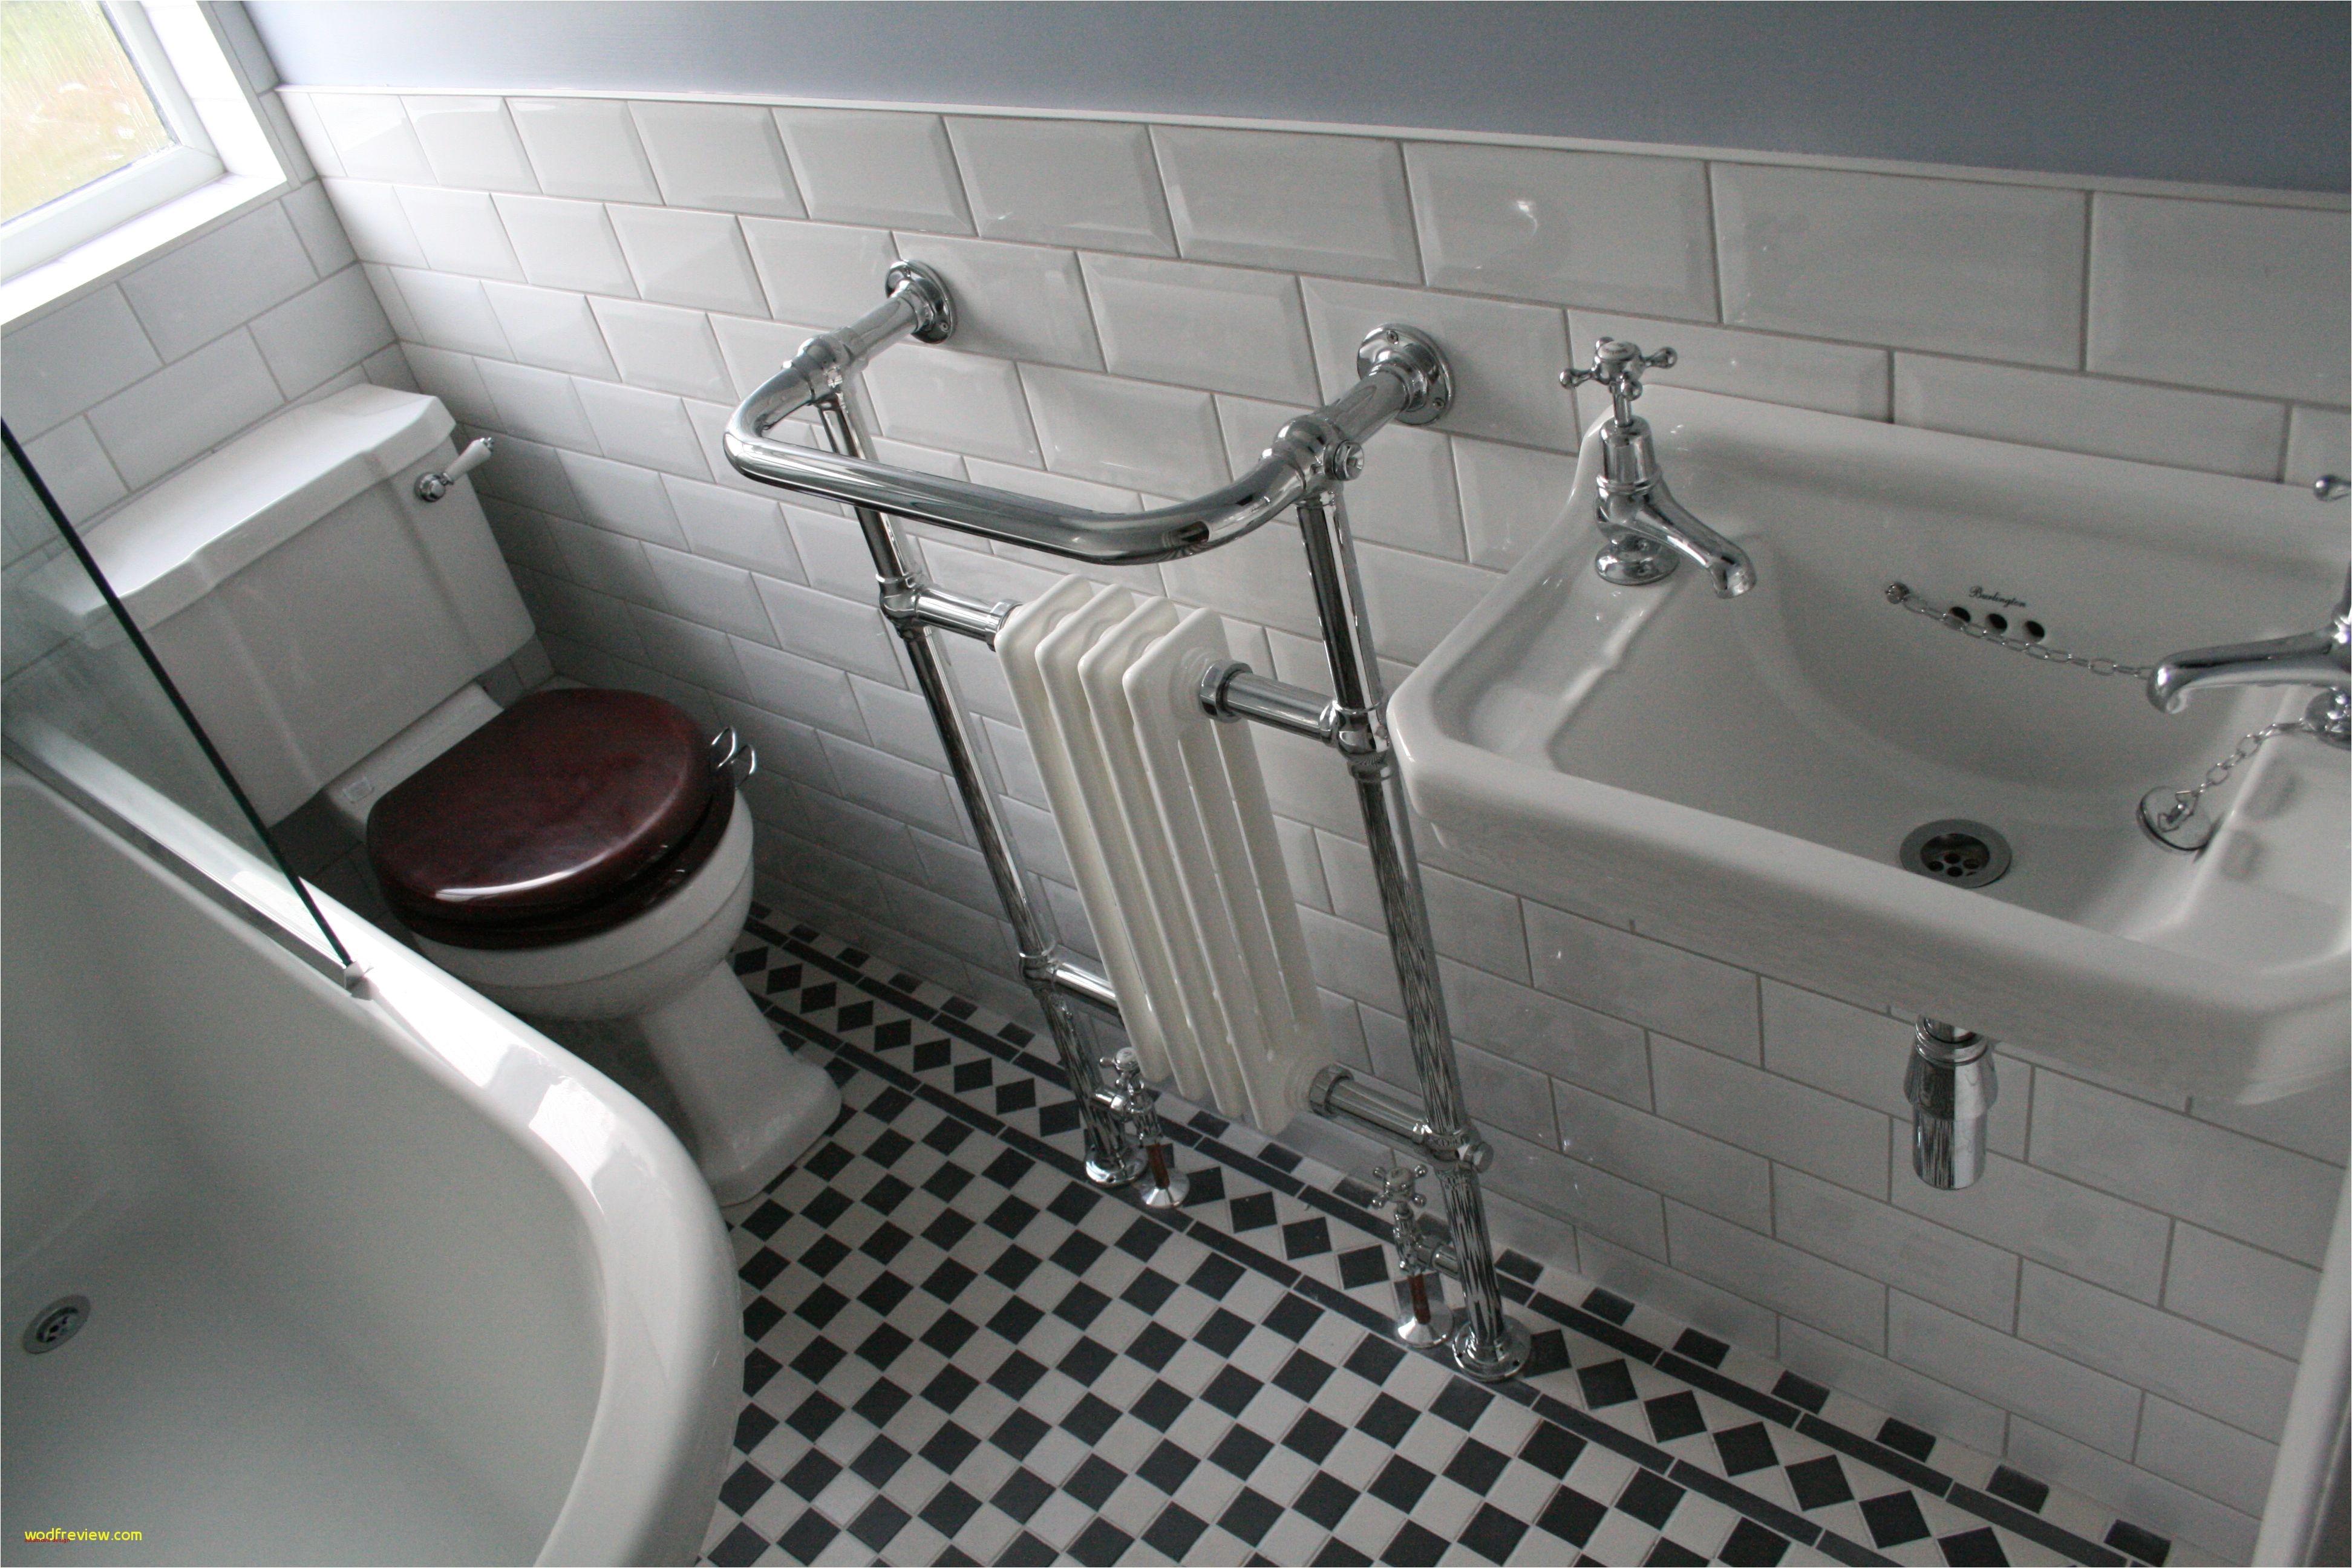 Surprising Award Winning Small Bathrooms Small Bathroom Design Ideas Luxury